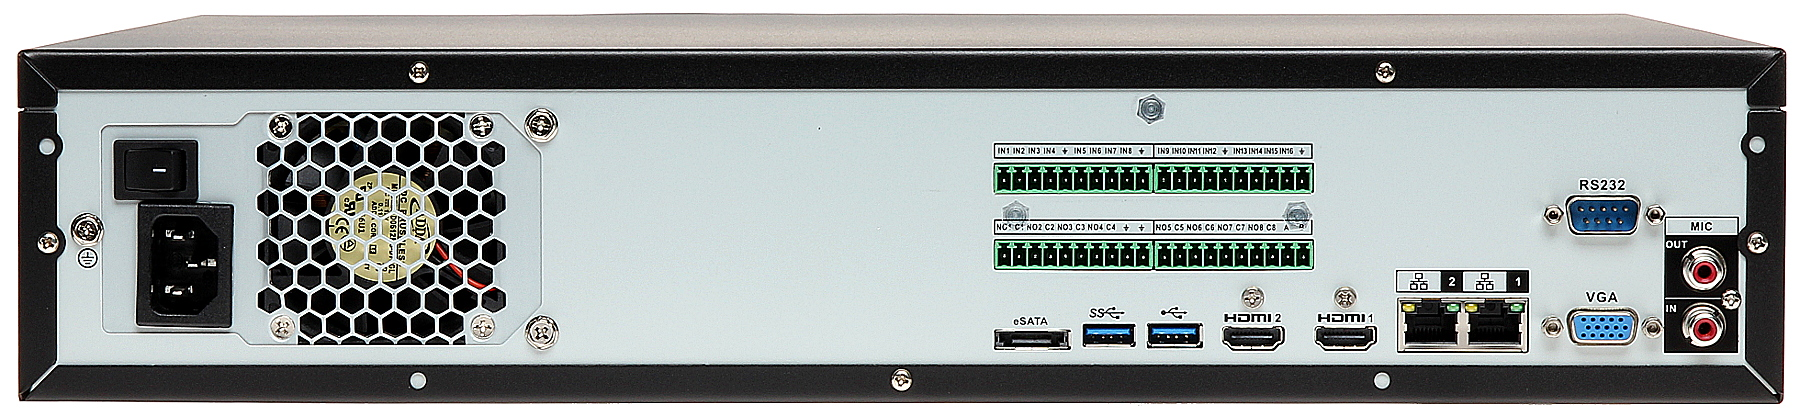 IP DVR DHI-NVR608-32-4KS2 32 CHANNELS +eSATA DAHUA - 32